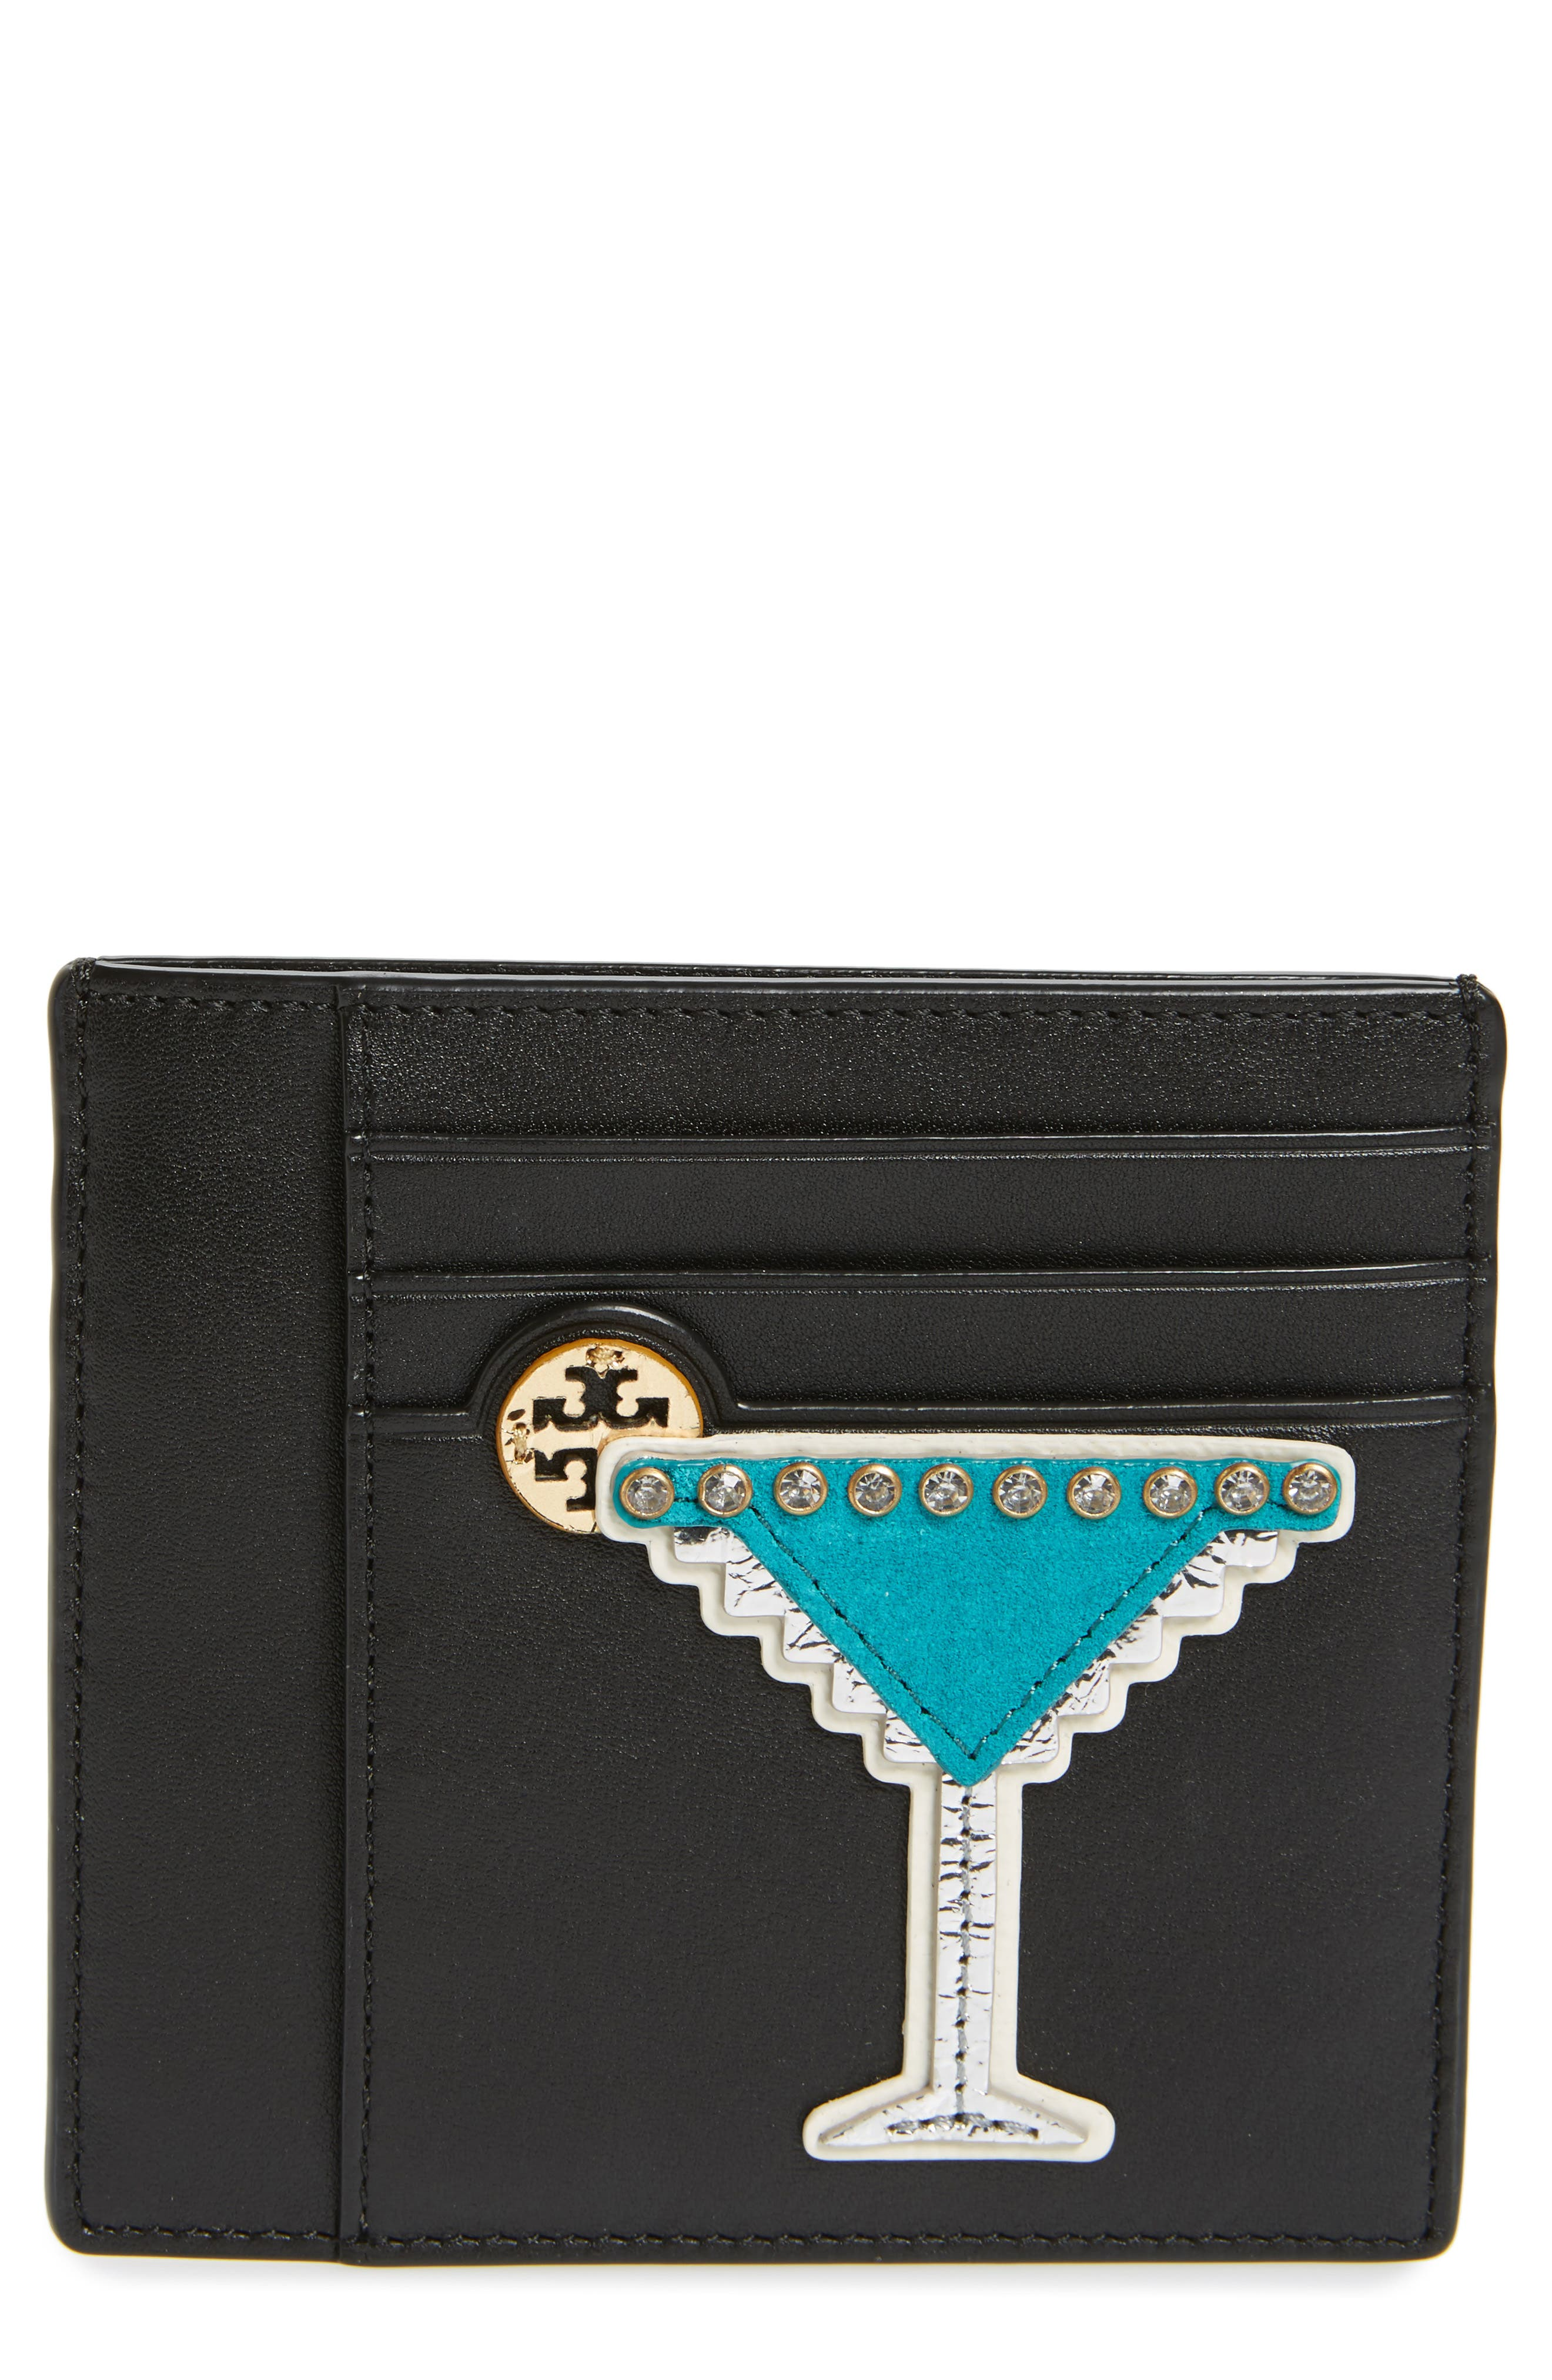 Alternate Image 1 Selected - Tory Burch Martini Appliqué Leather Card Case